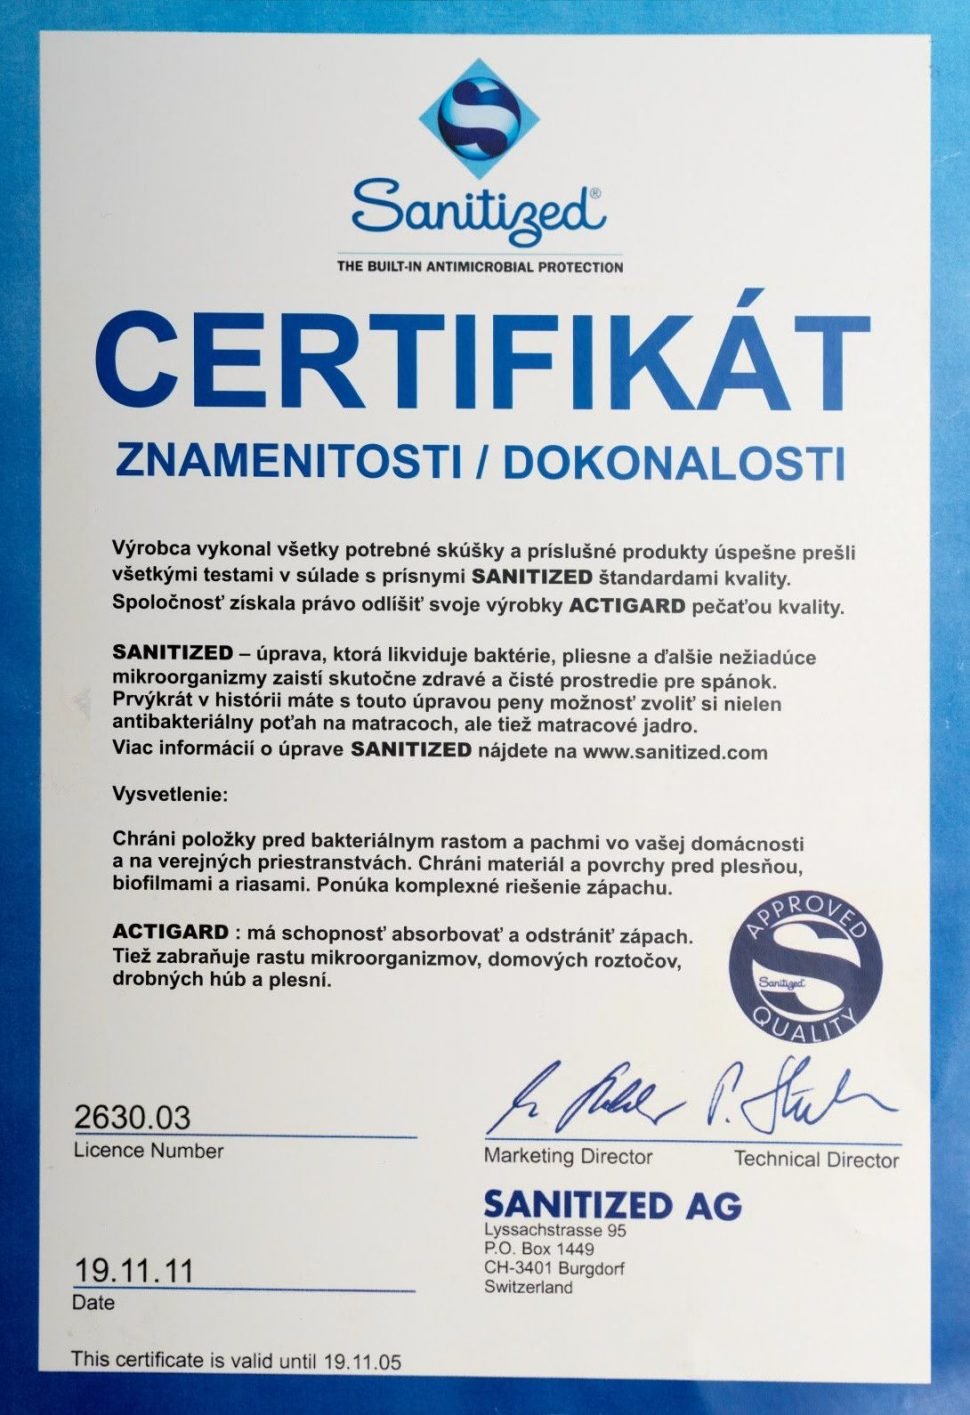 Matrace pre zdravie certifikát znamenitosti